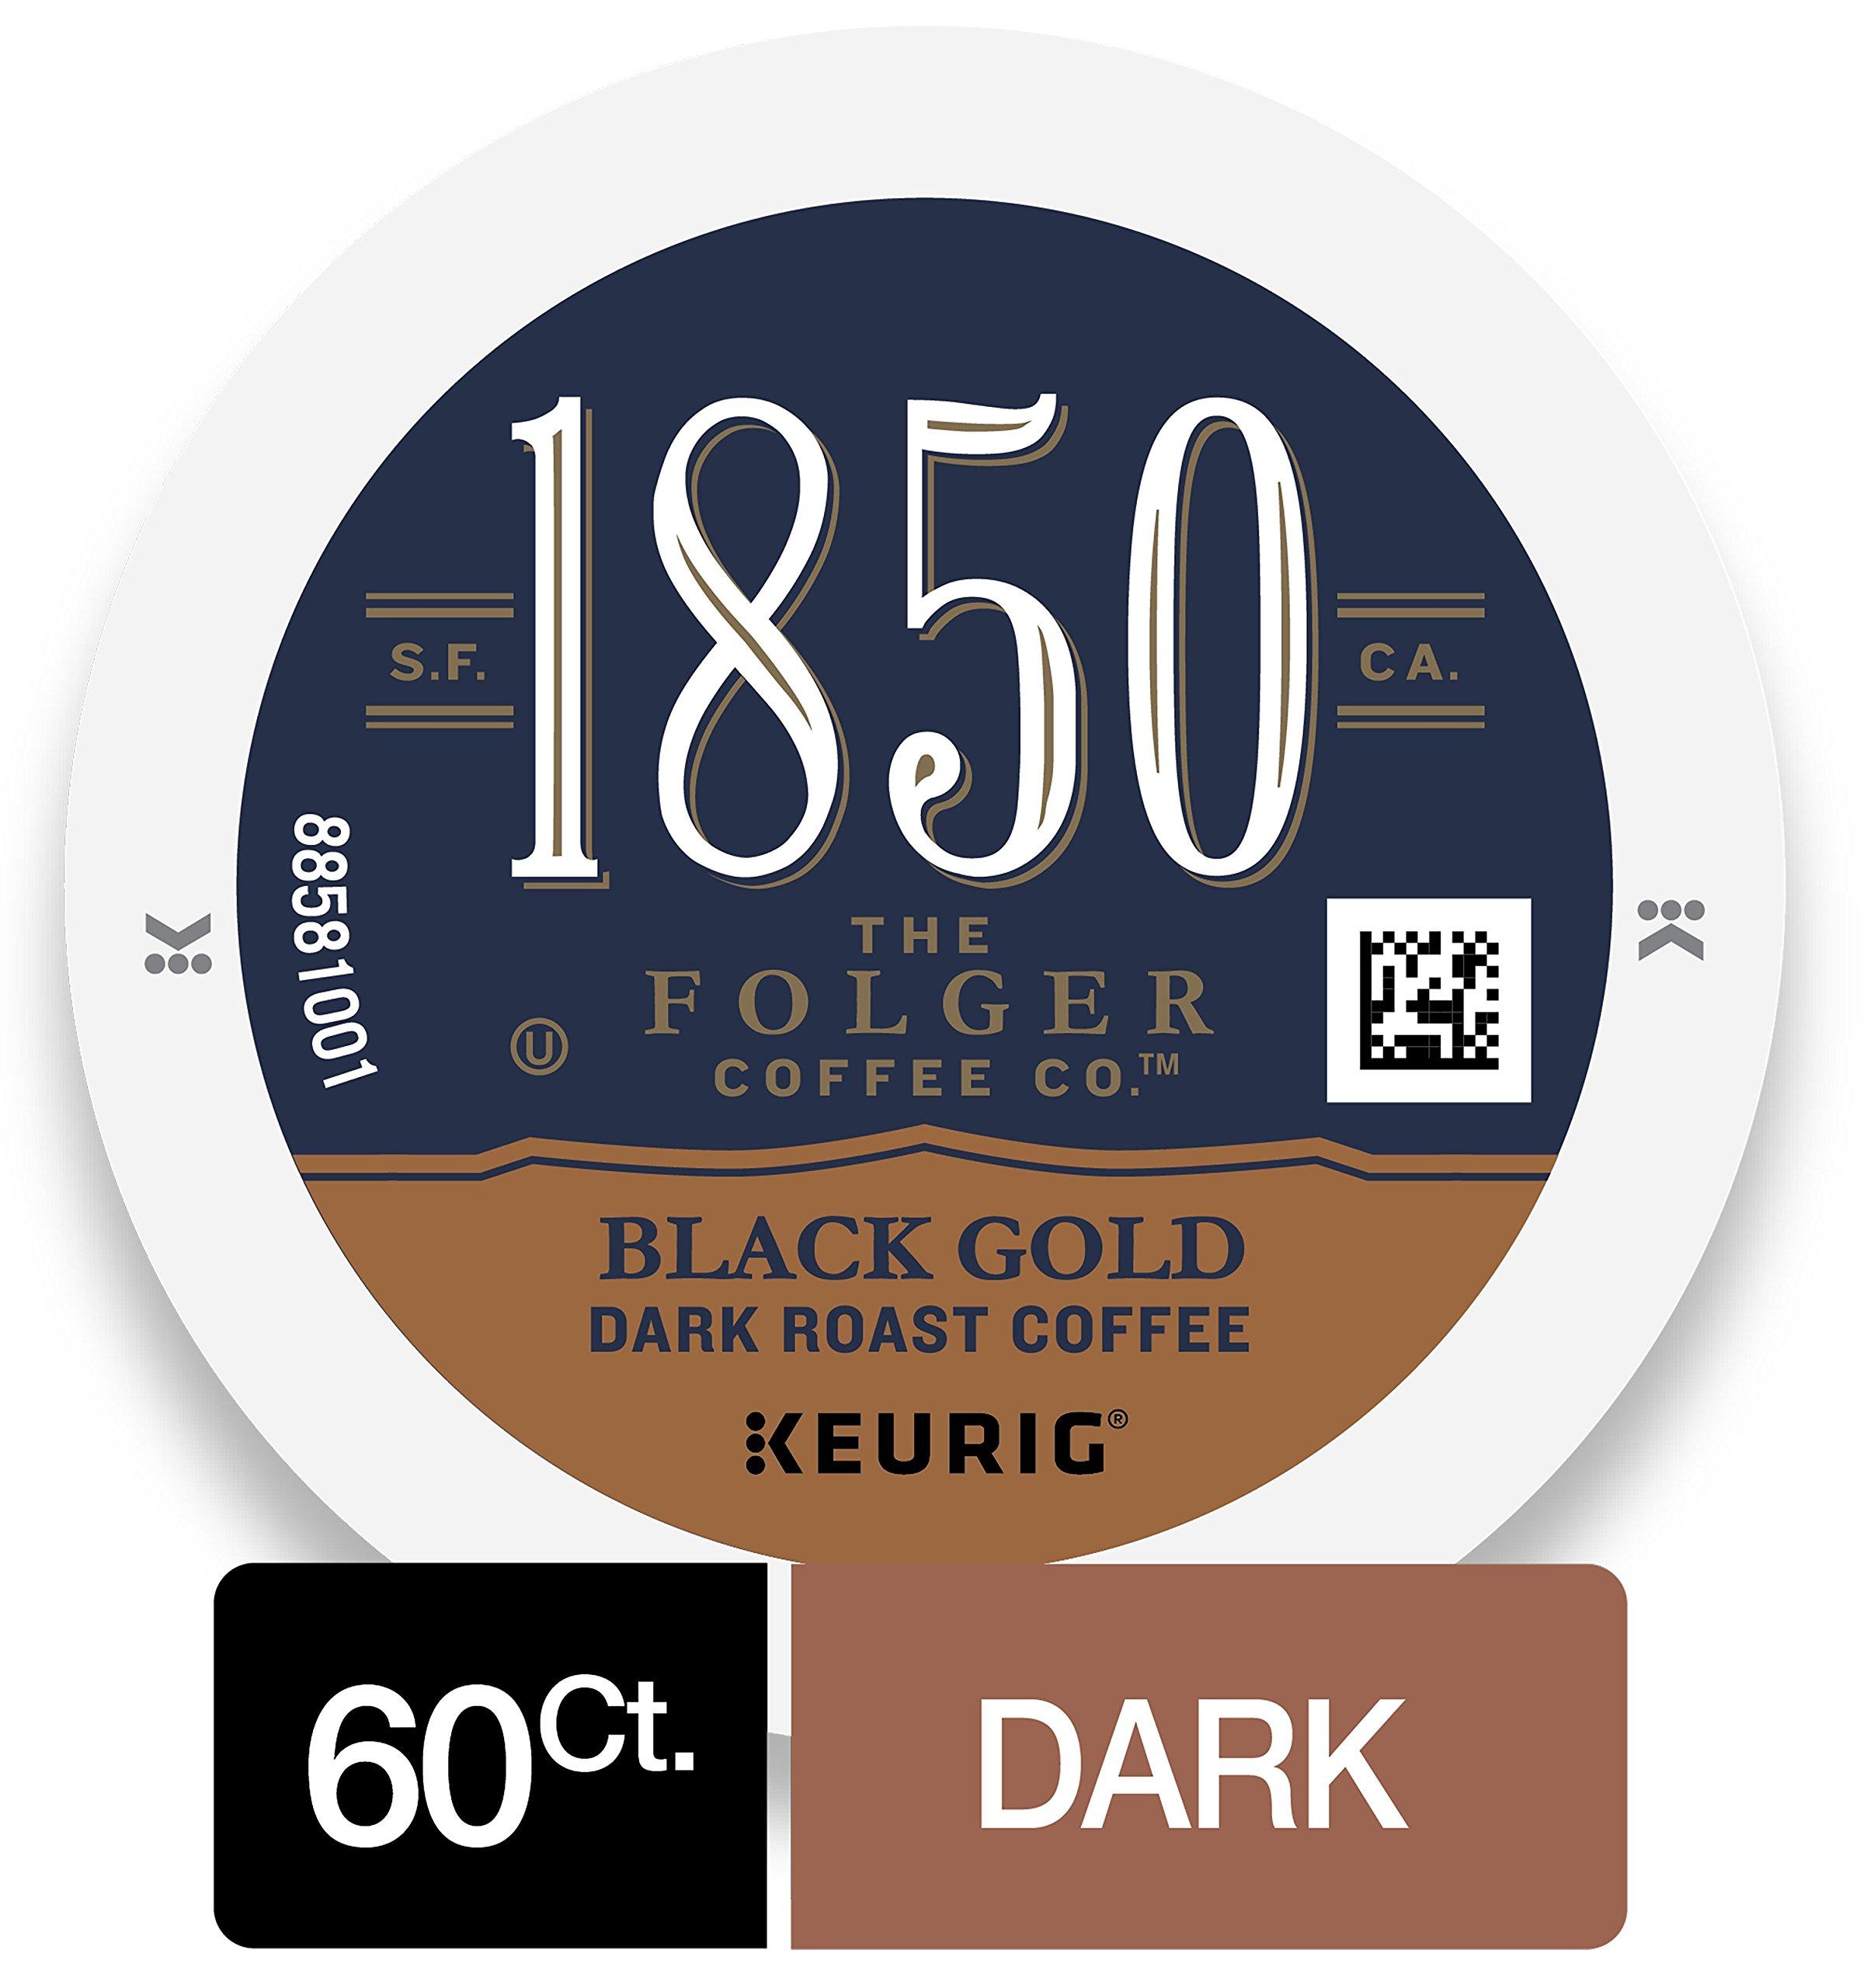 1850 Black Gold, Dark Roast Coffee, K-Cup Pods for Keurig Brewers, 10 Count (Pack of 6)